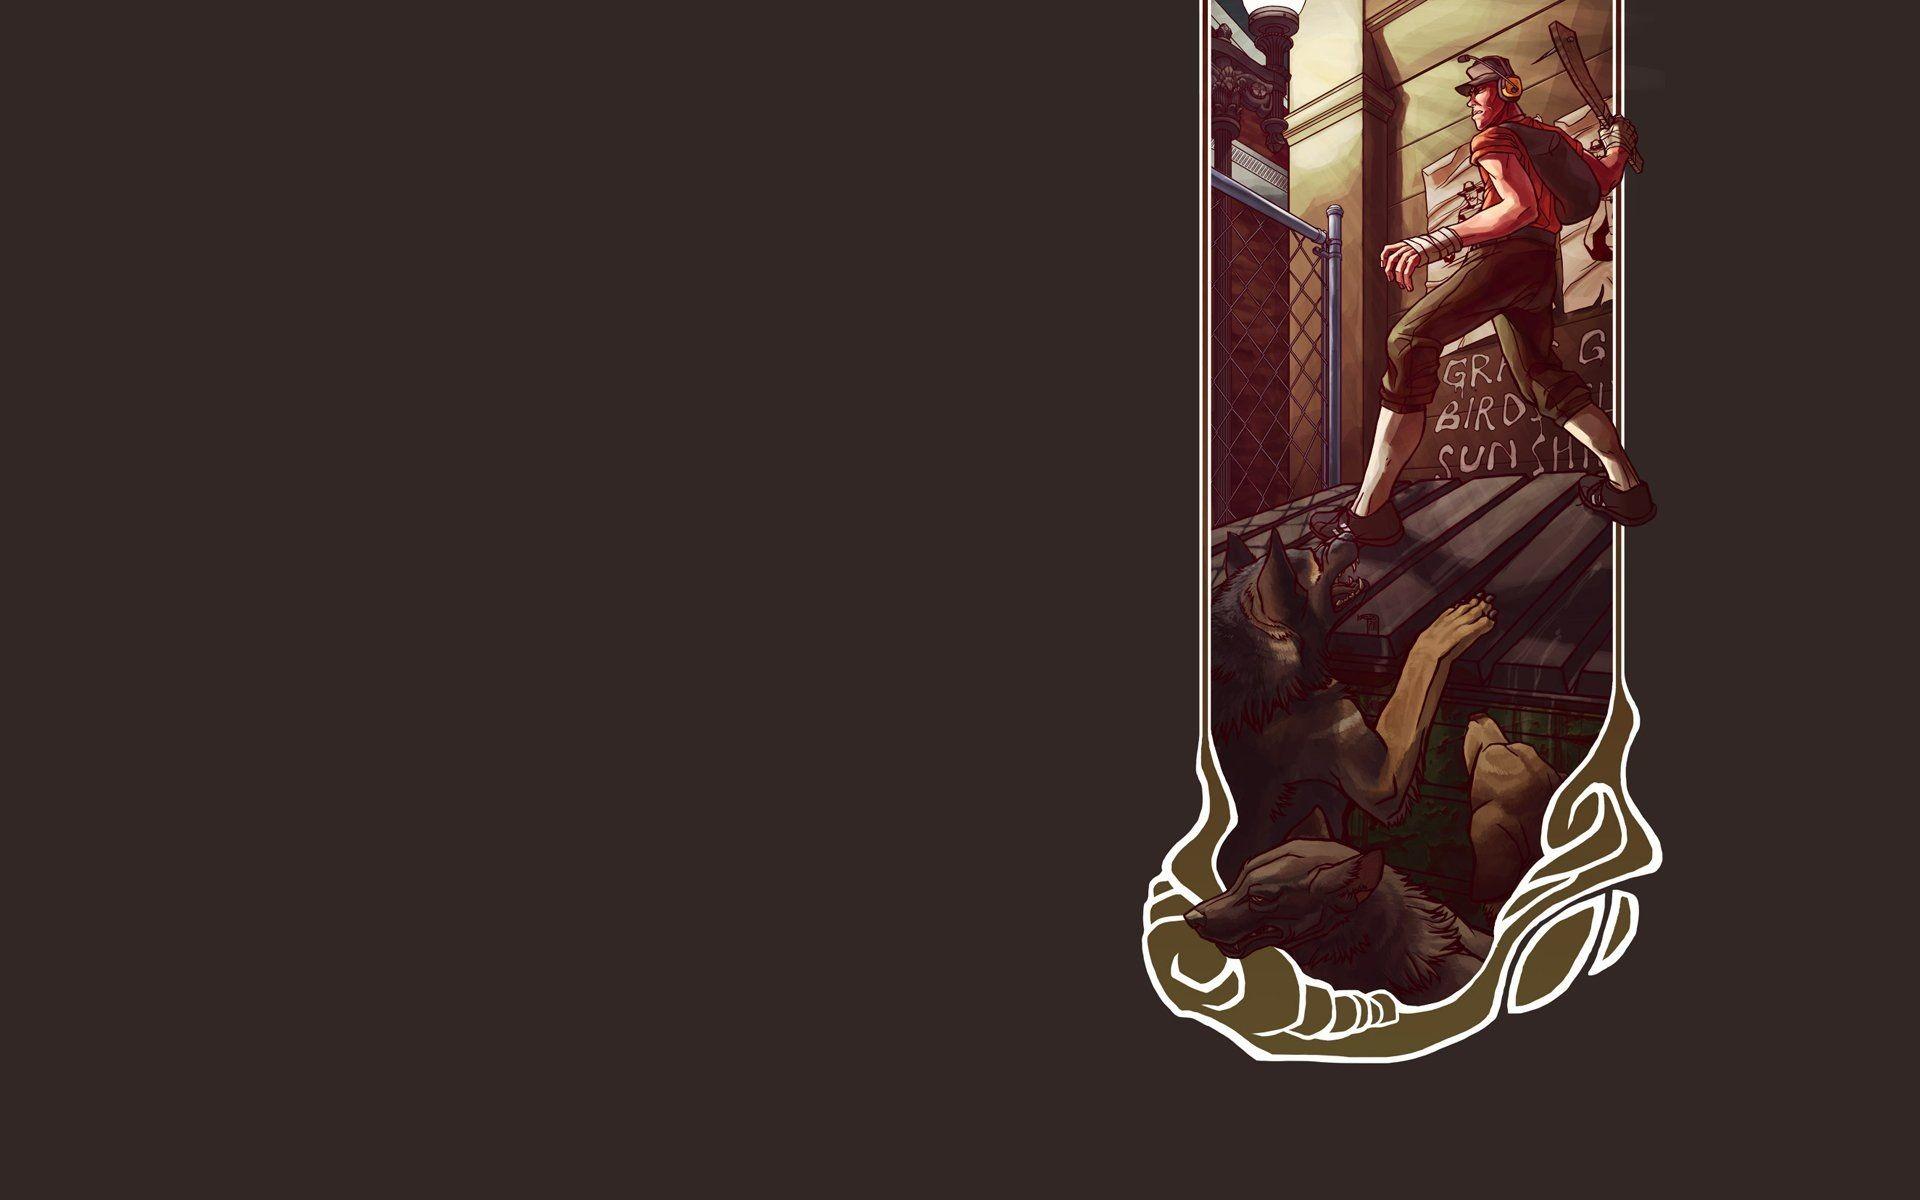 Valve Corporation Spy TF2 gentlemen Team Fortress 2 wallpaper .